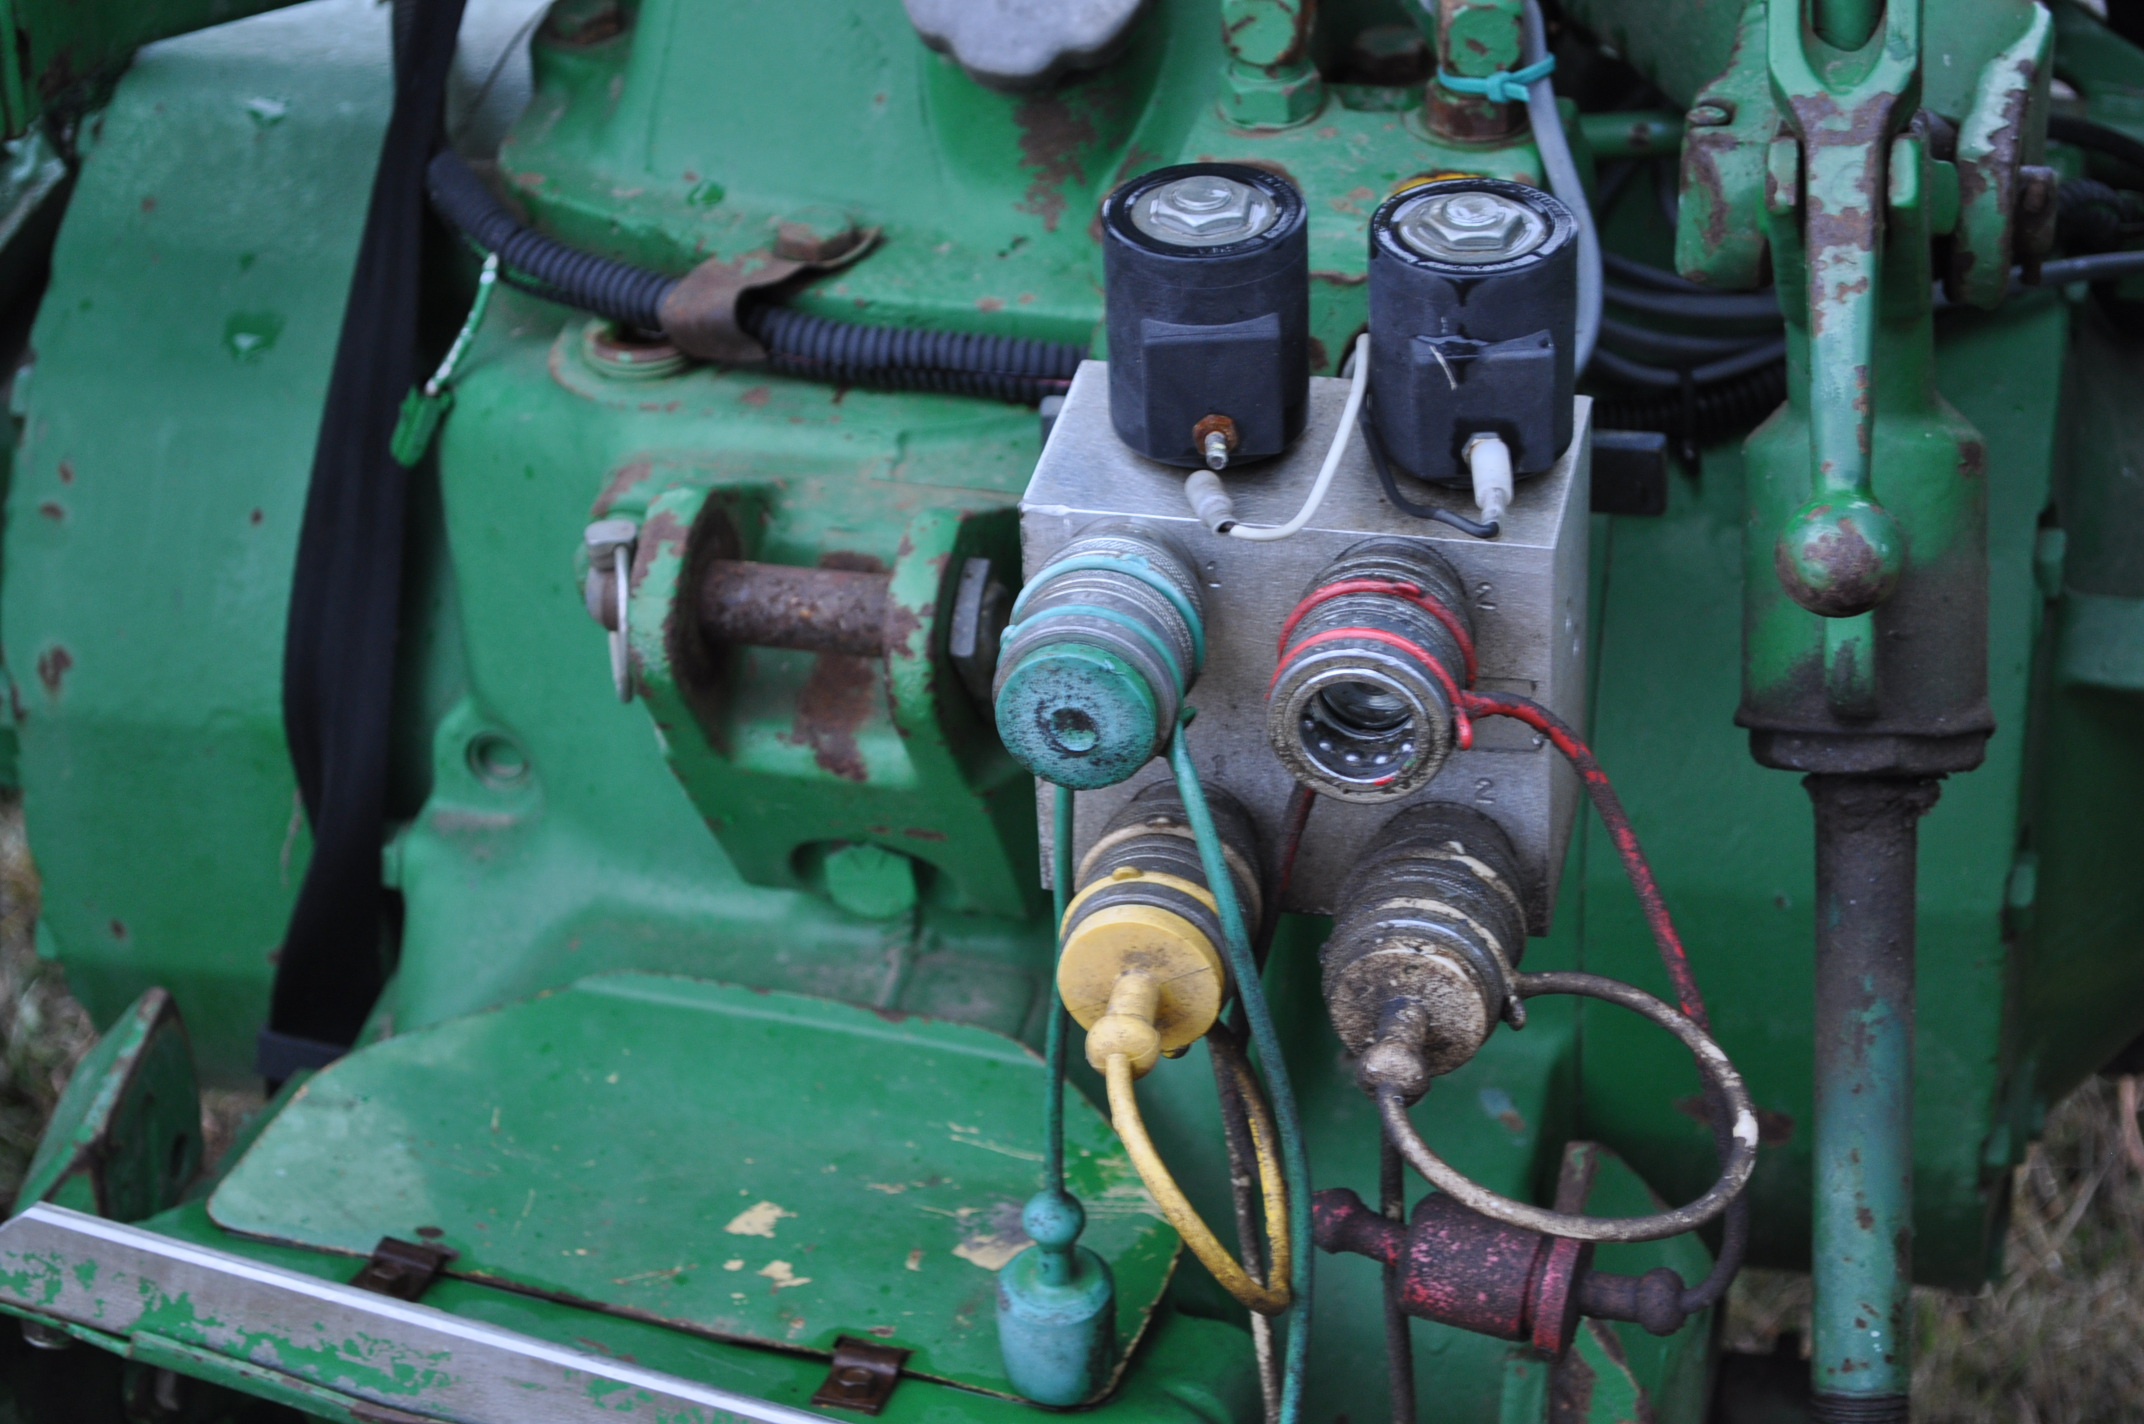 John Deere 2630 tractor, diesel, 16.9-28 rear, 9.5-15 front, 1 hyd remote, 540 pto, 3 pt, 4260 - Image 14 of 18